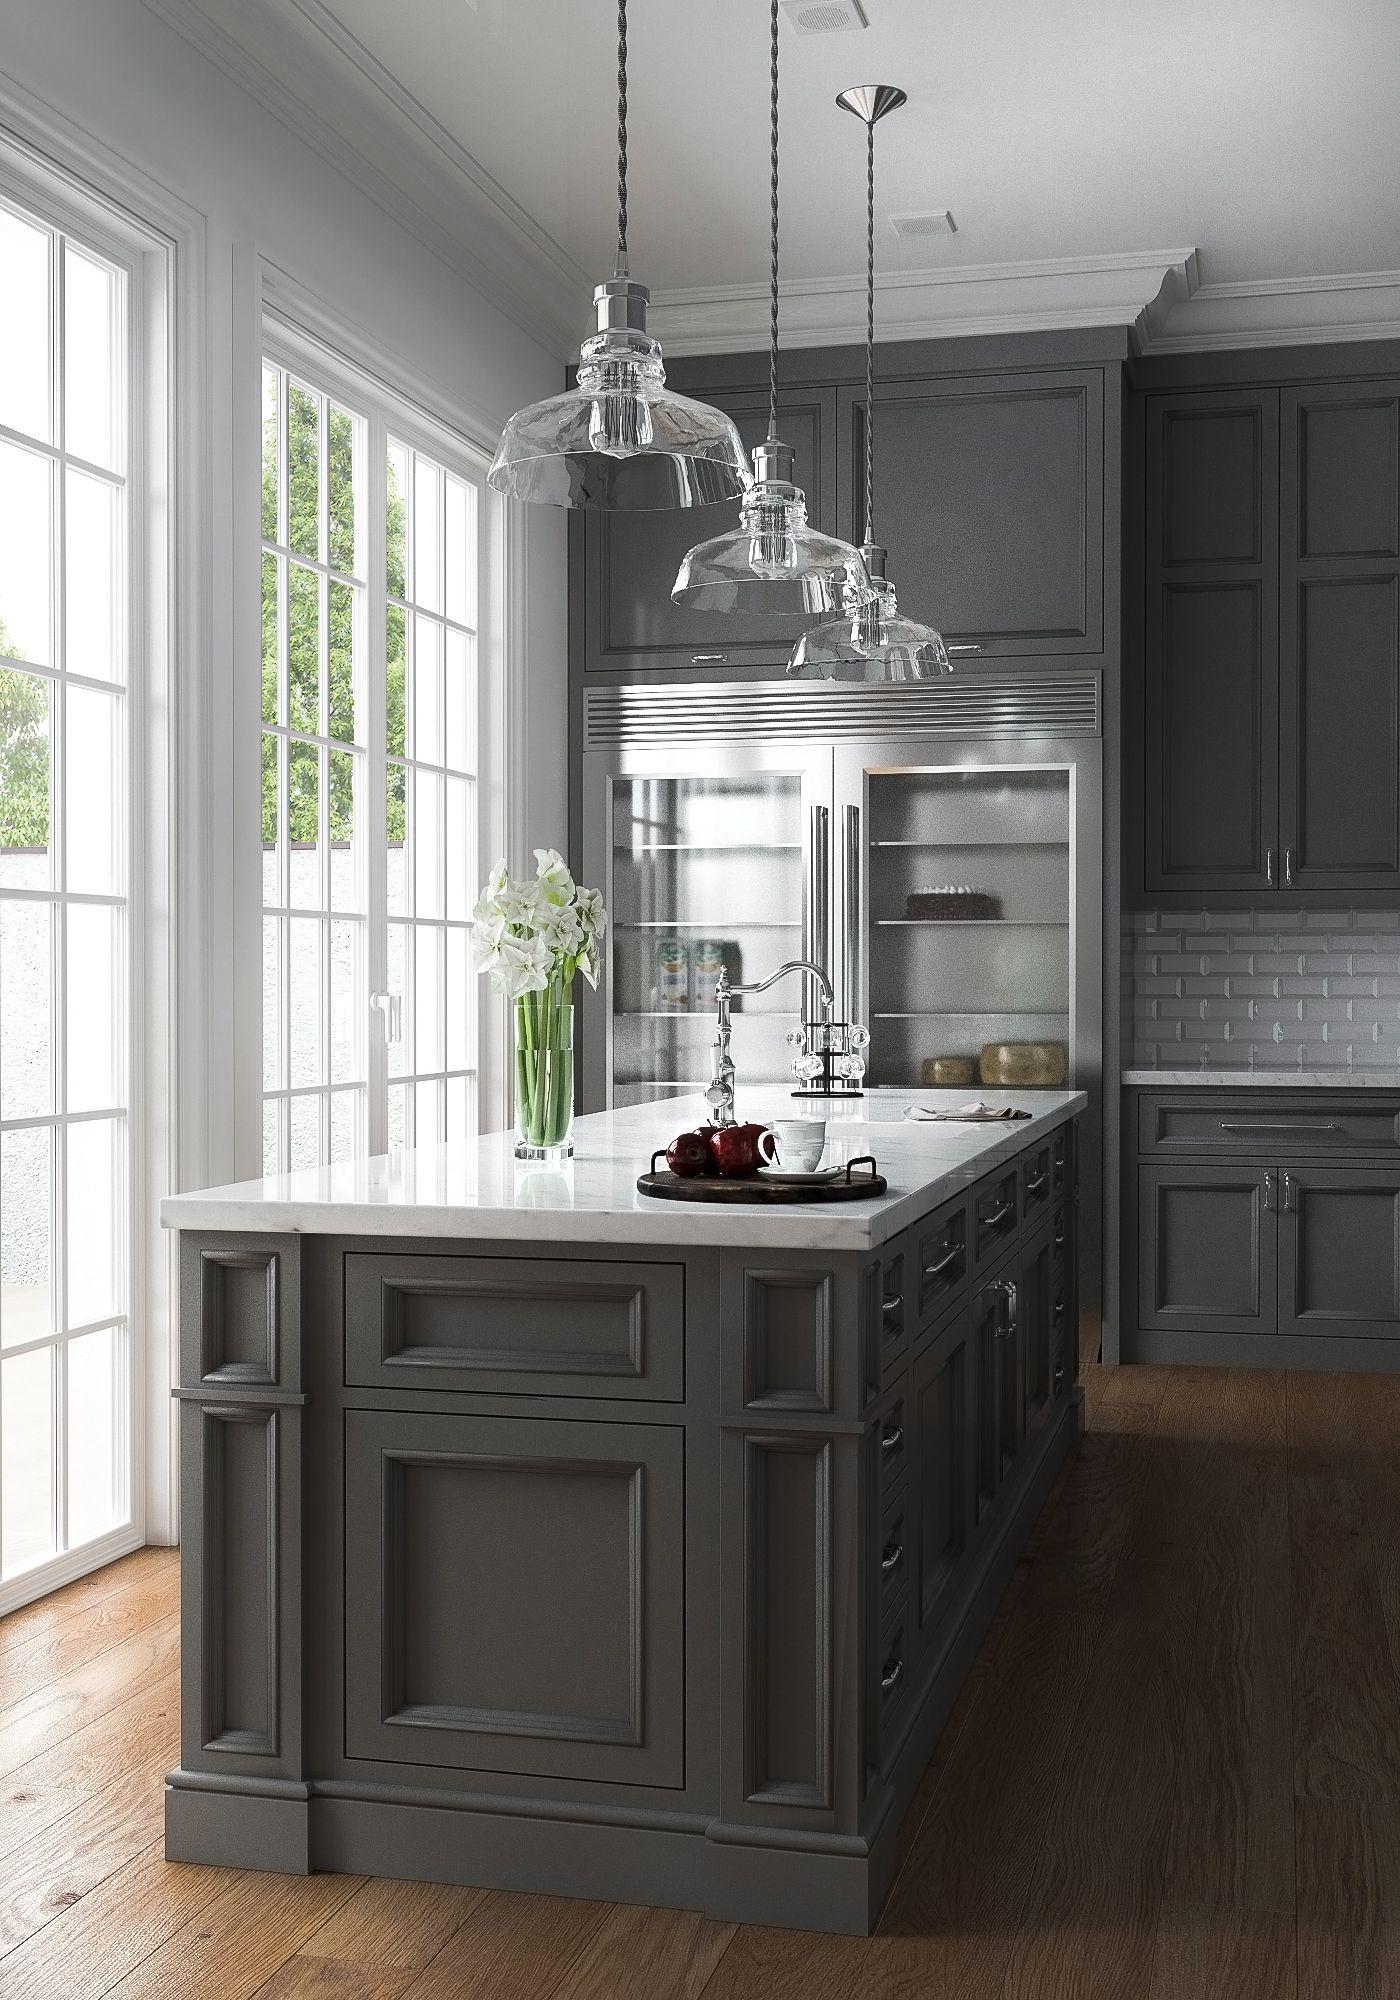 3d visualisation american kitchen on behance grey kitchen designs grey kitchen cabinets on kitchen decor grey cabinets id=38233